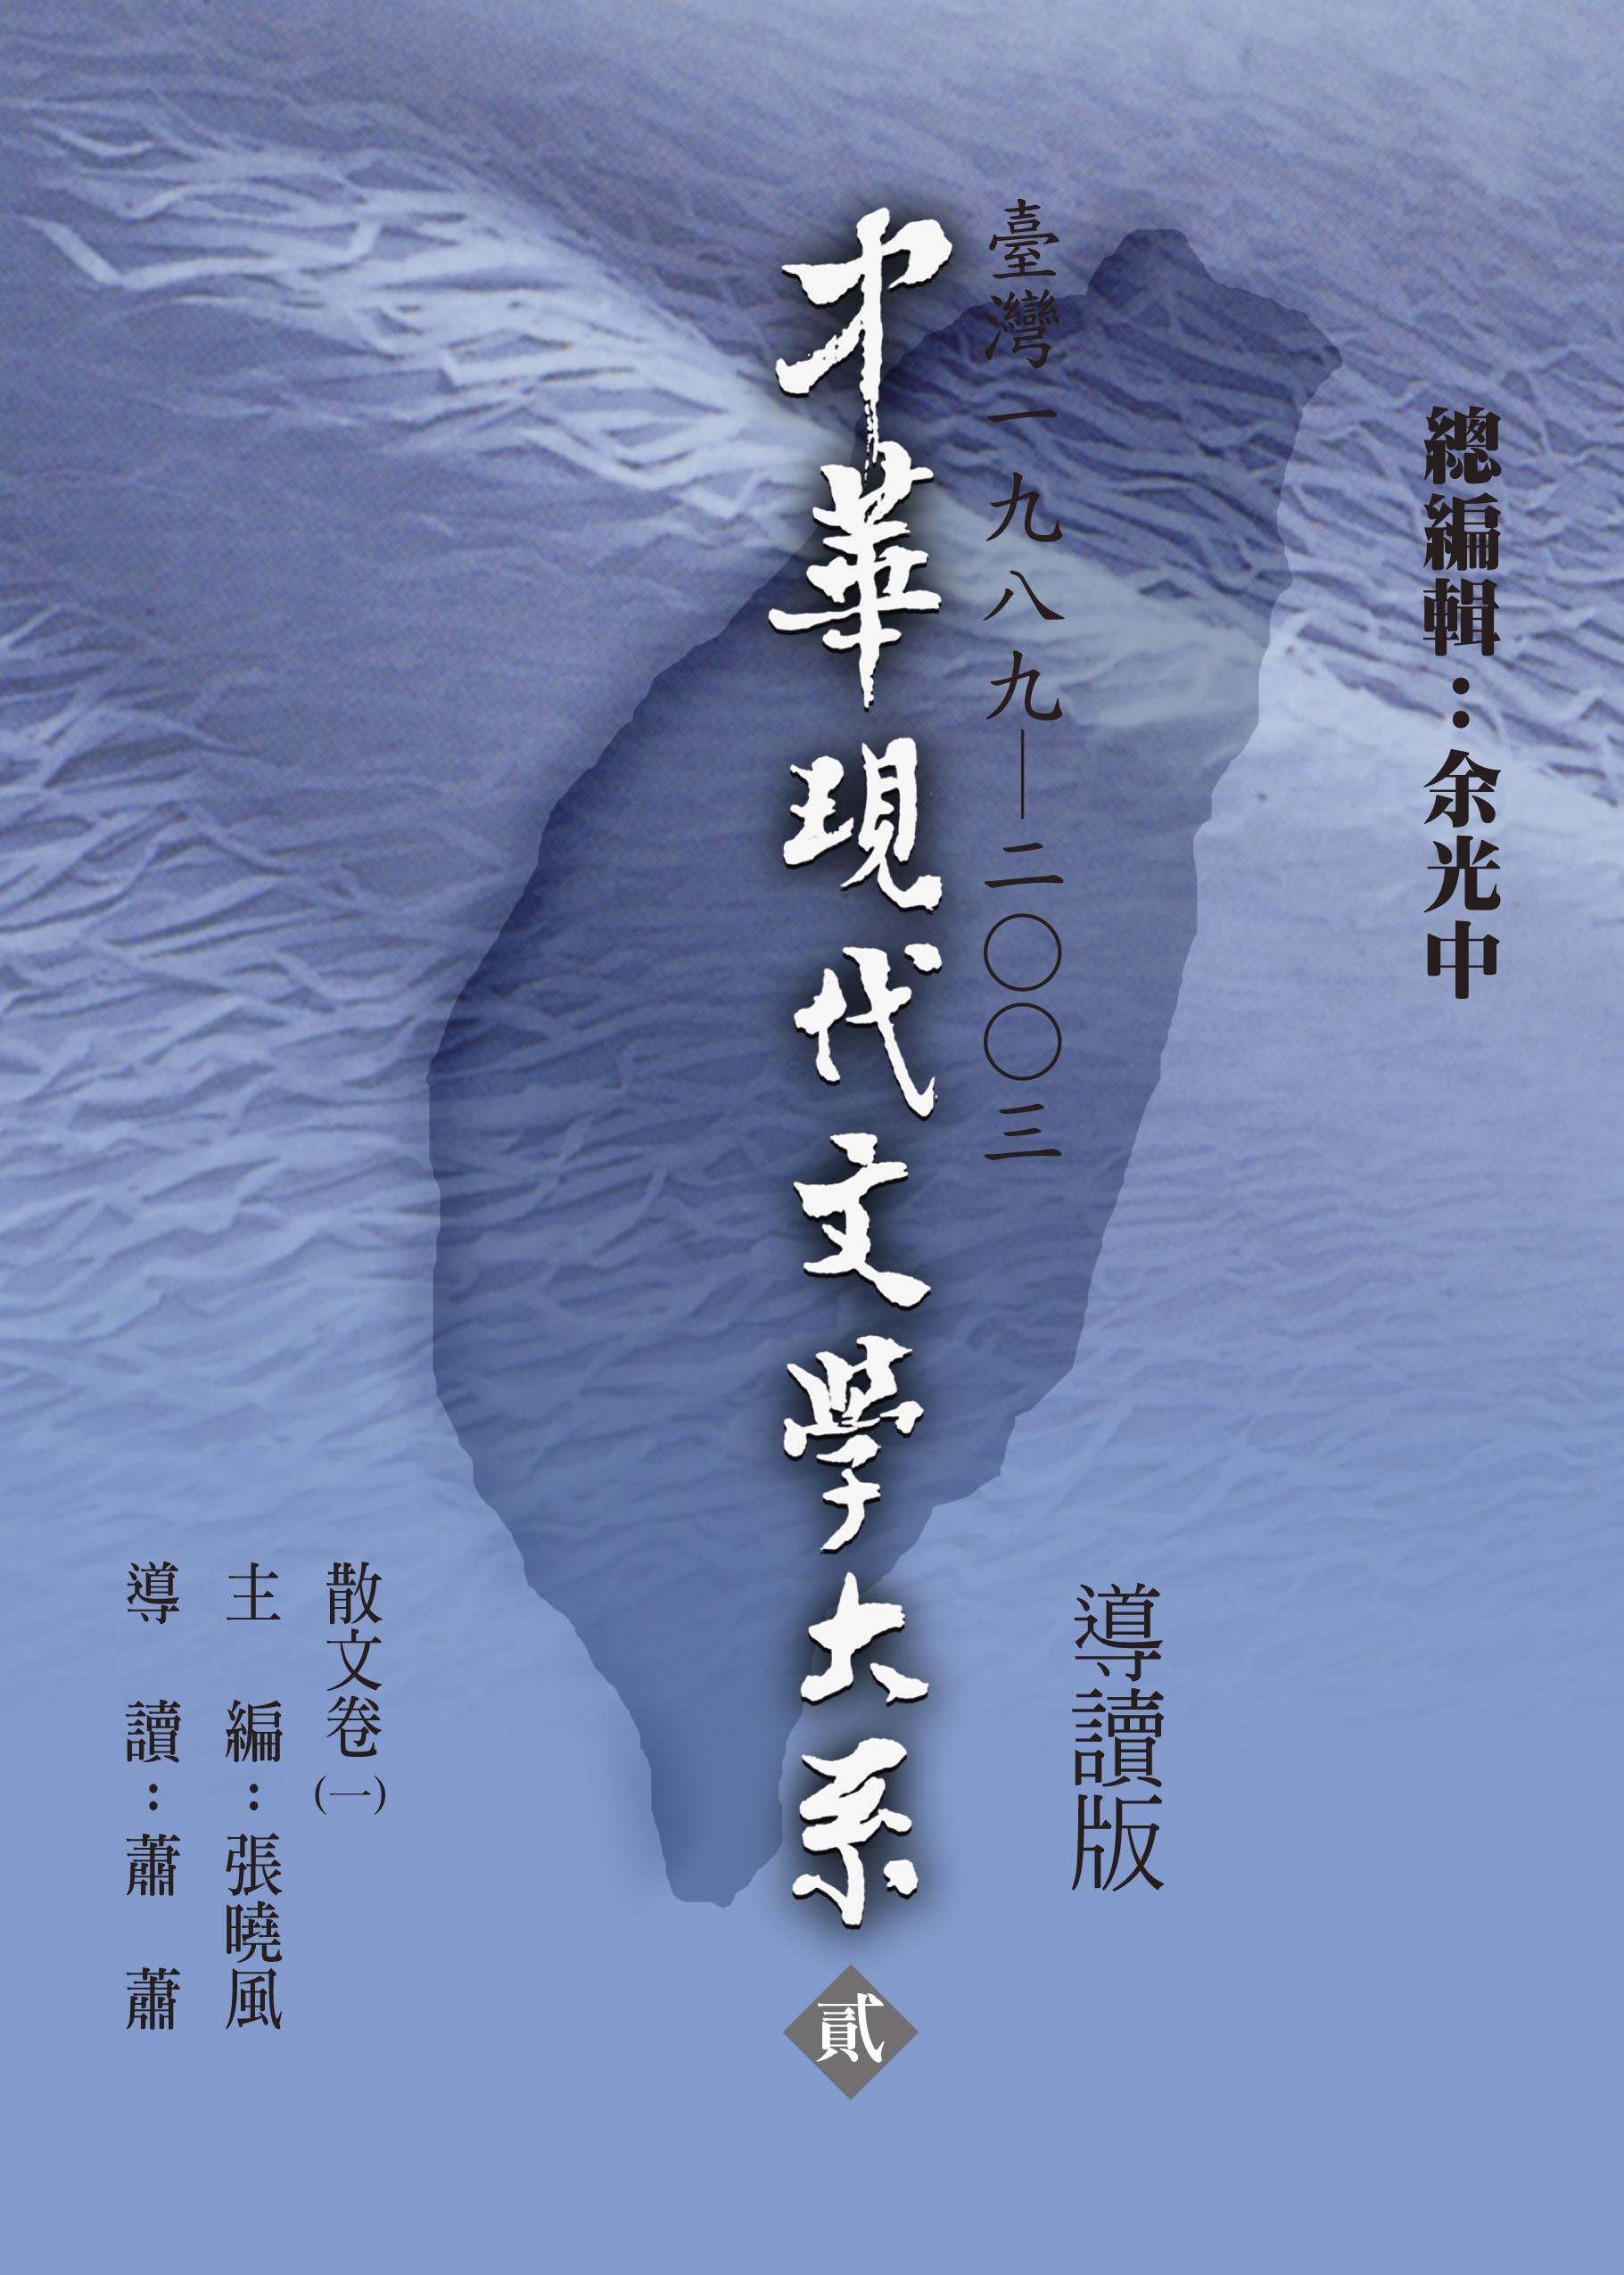 Kk023 中華現代文學大系二散文卷1